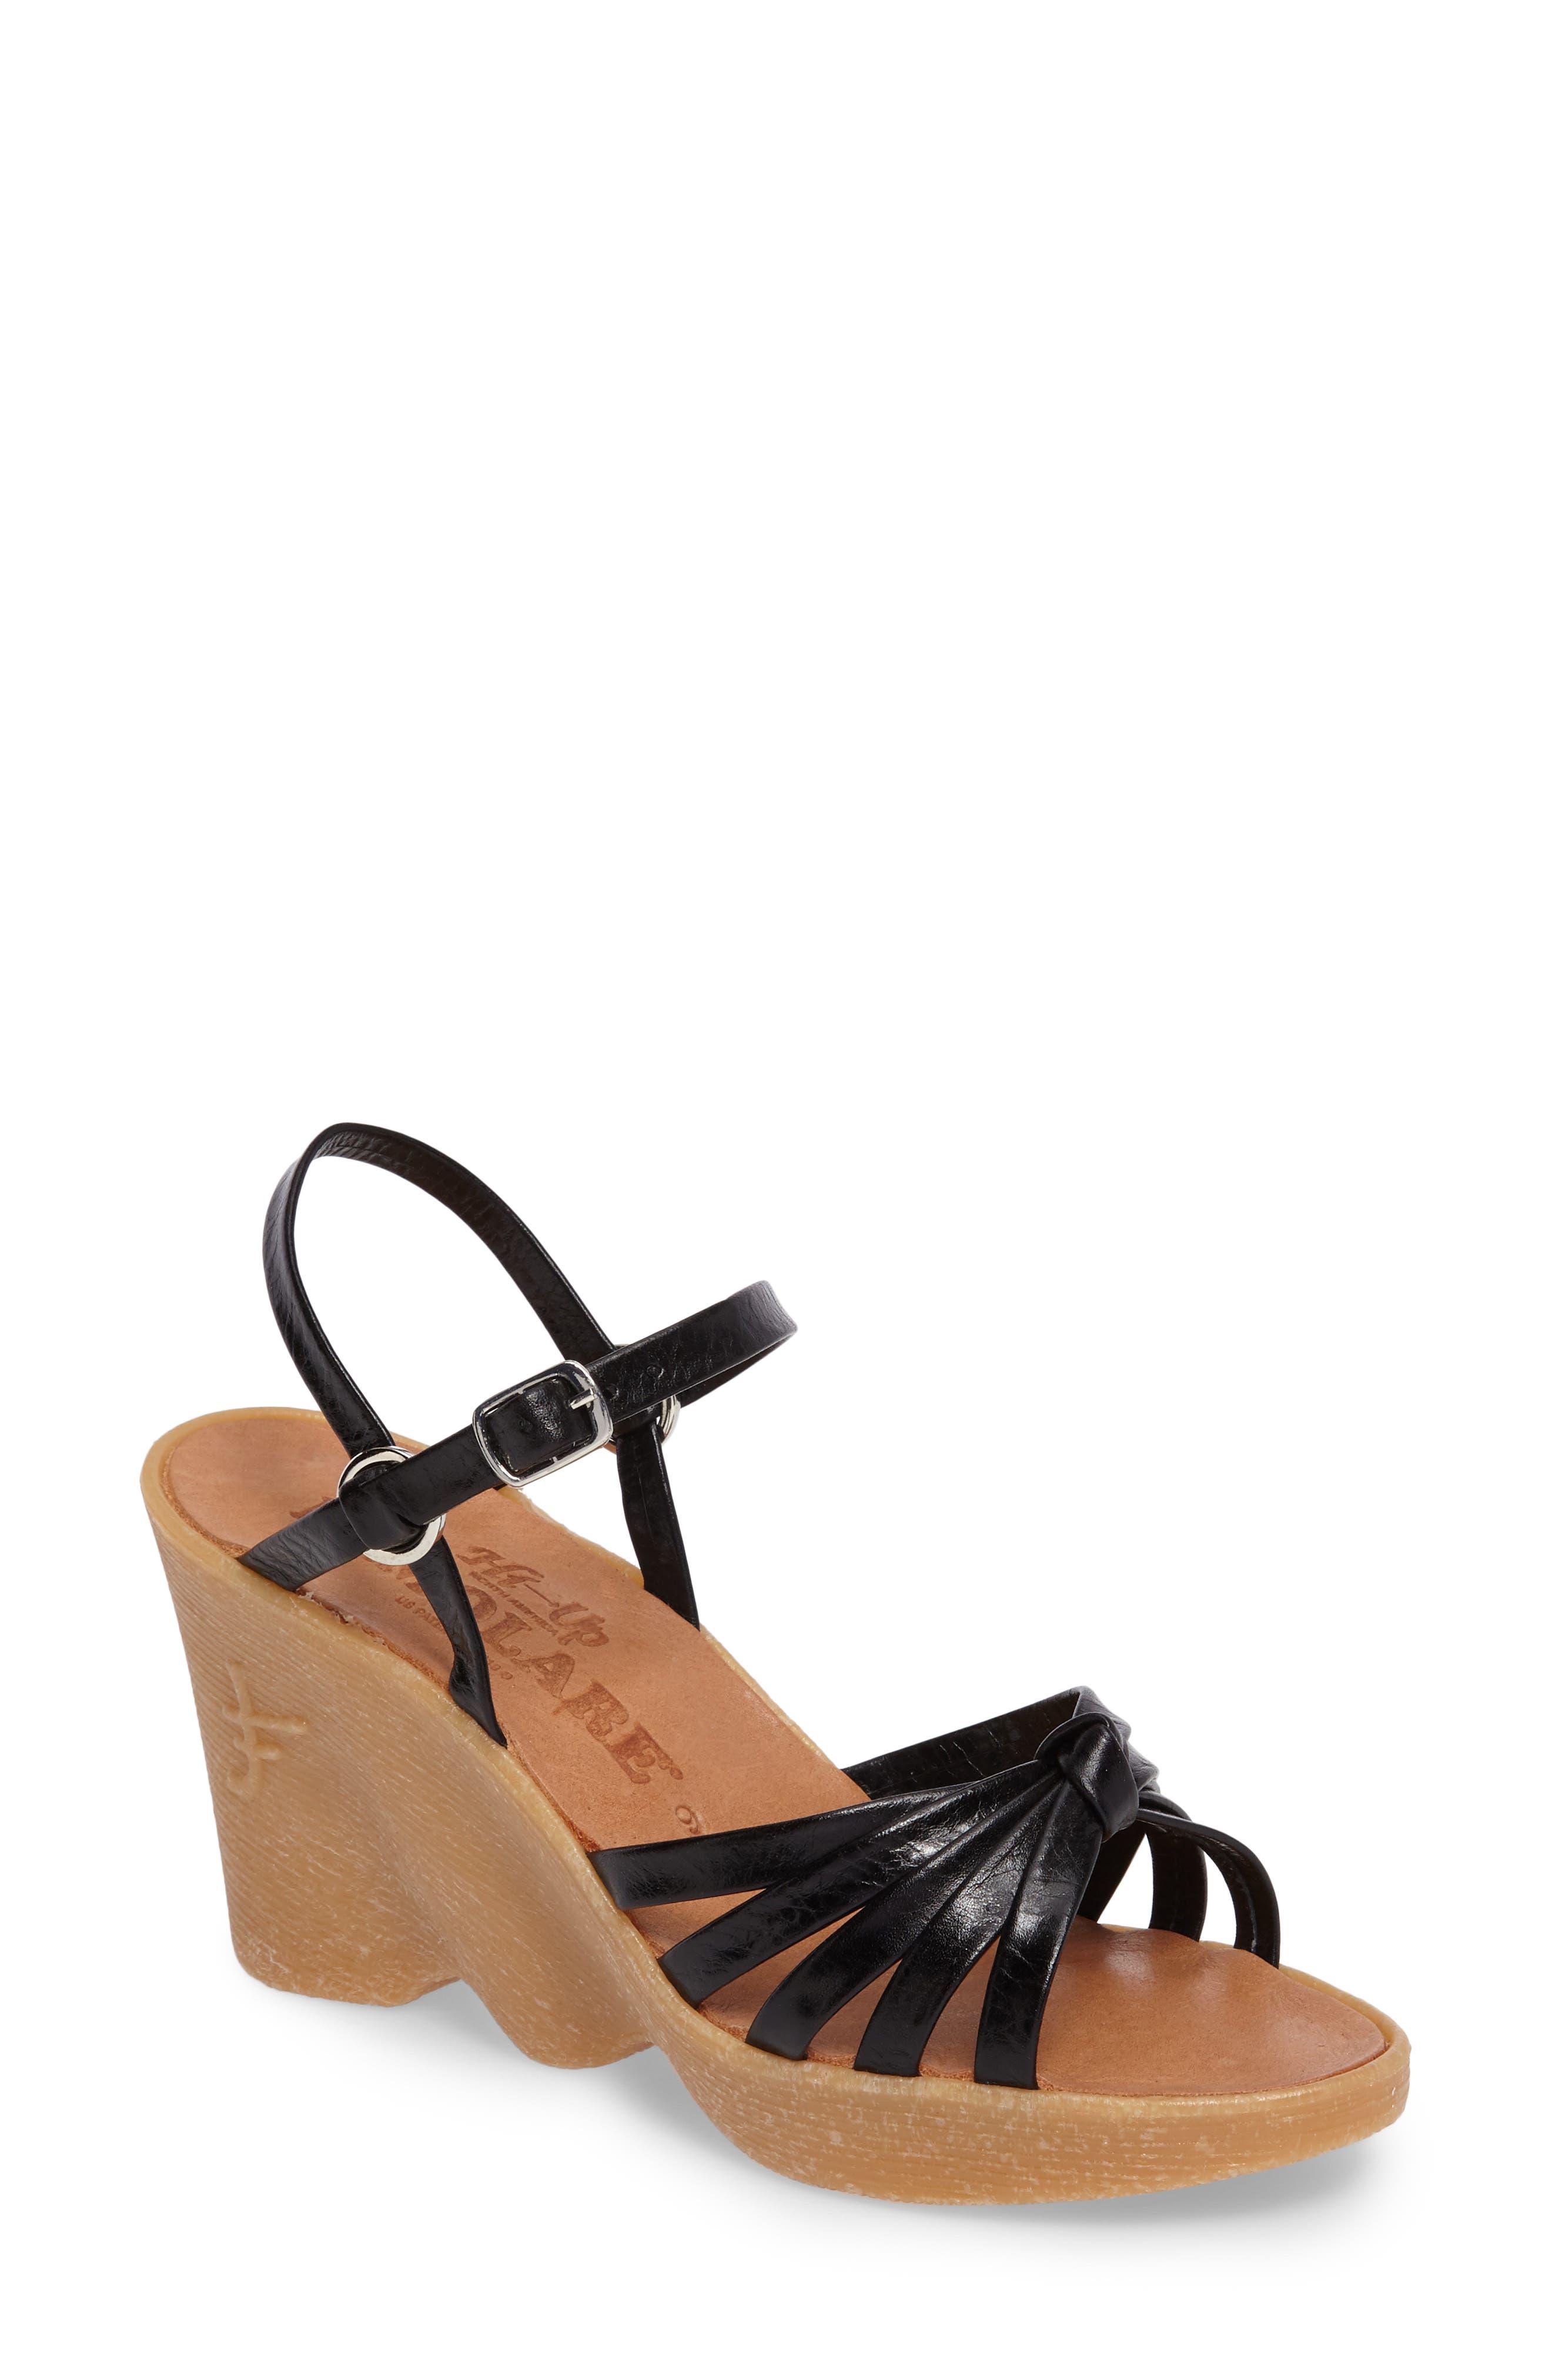 Knotty Monkey Wedge Sandal,                             Main thumbnail 1, color,                             Coal Leather